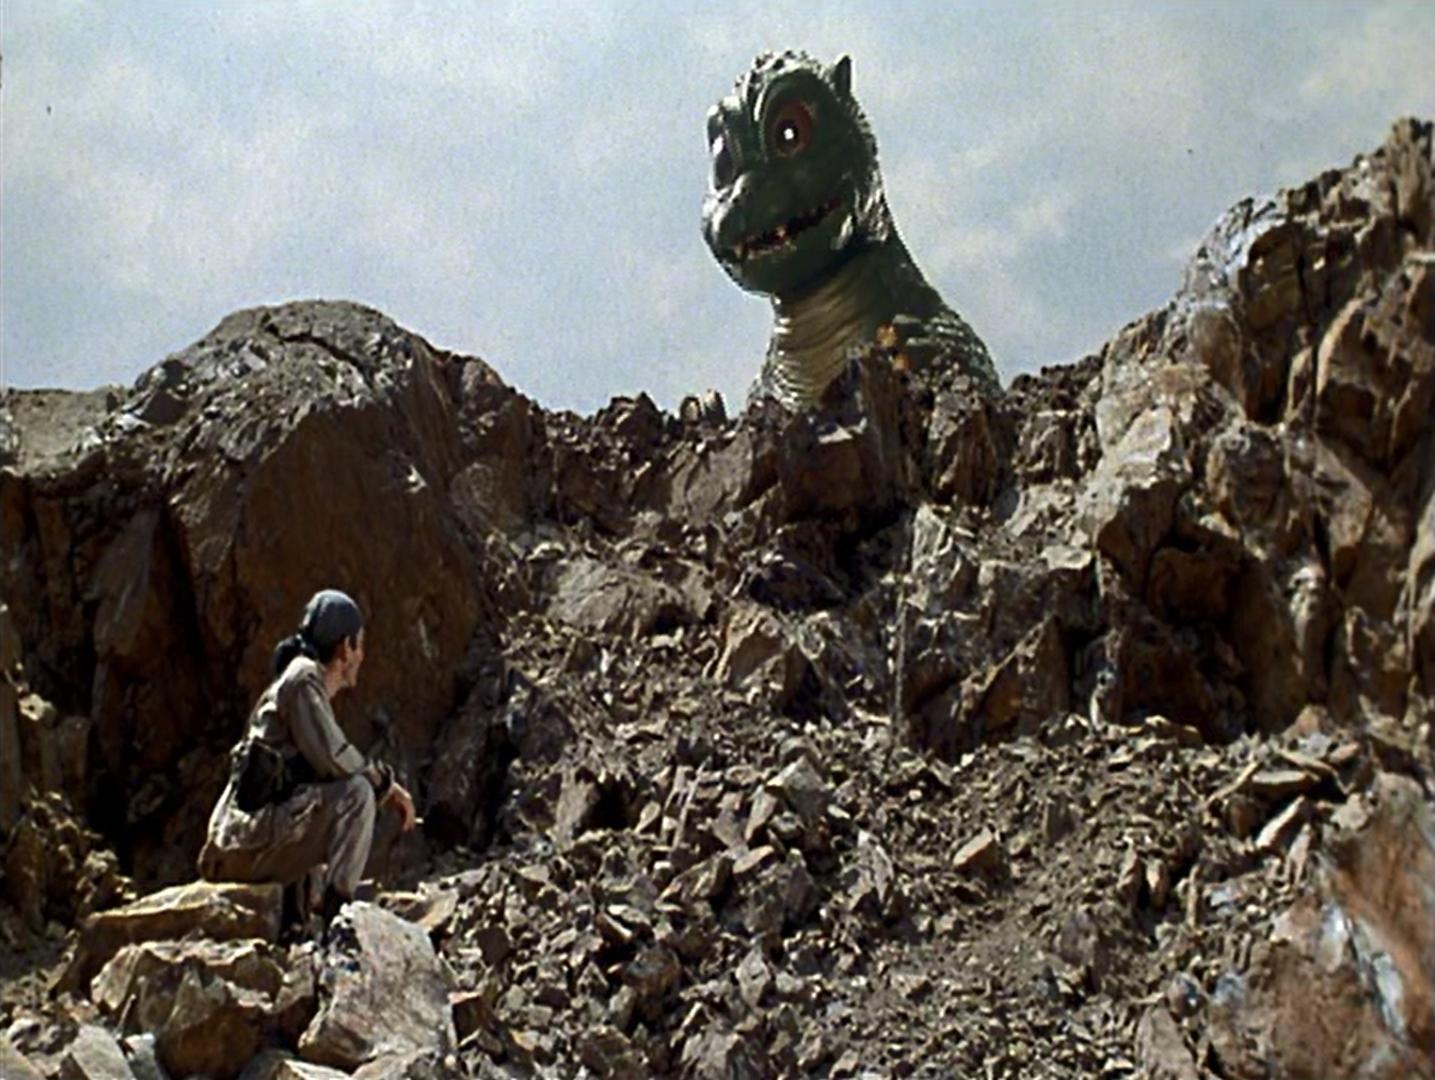 Godzilla Vs Space Godzilla Movie HD free download 720p